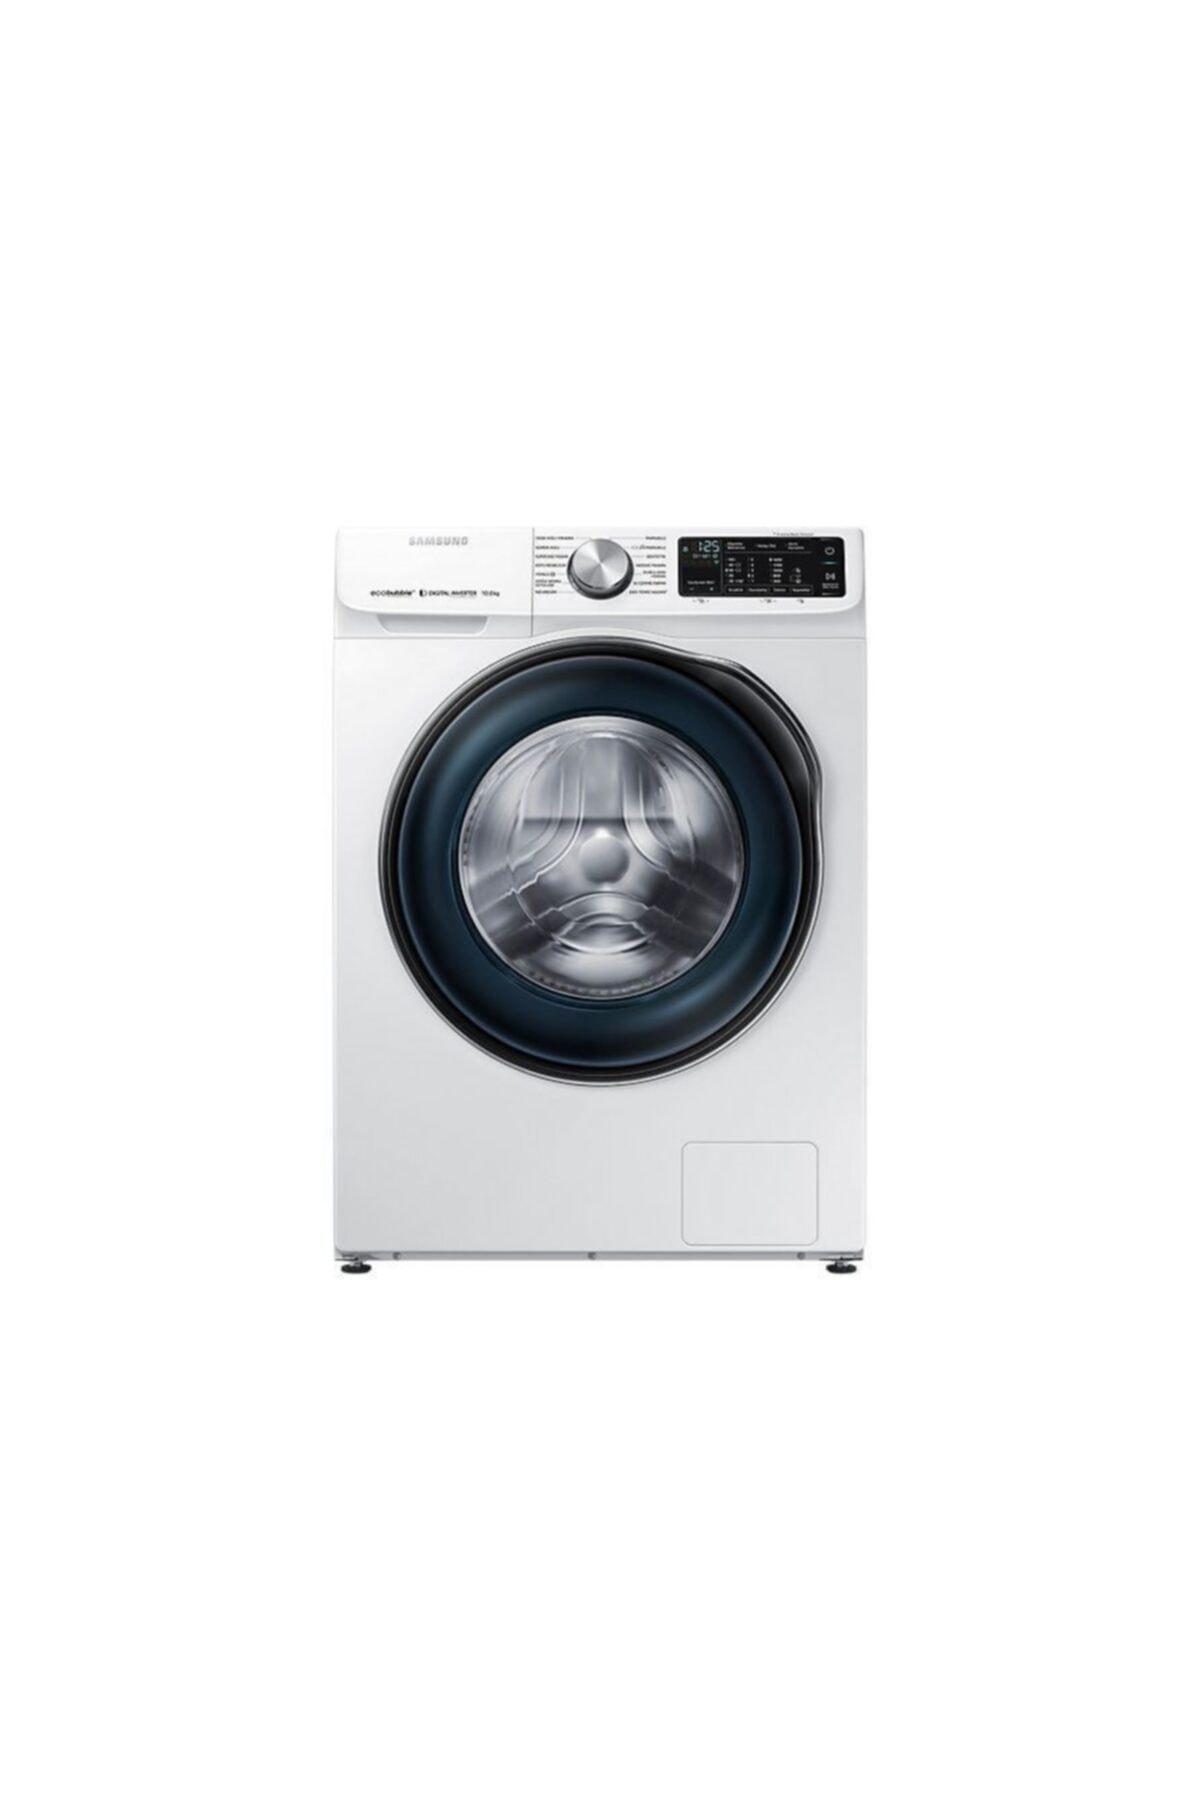 Samsung WW10N644RBW/AH A+++ 1400 Devir 10 kg Çamaşır Makinesi 1